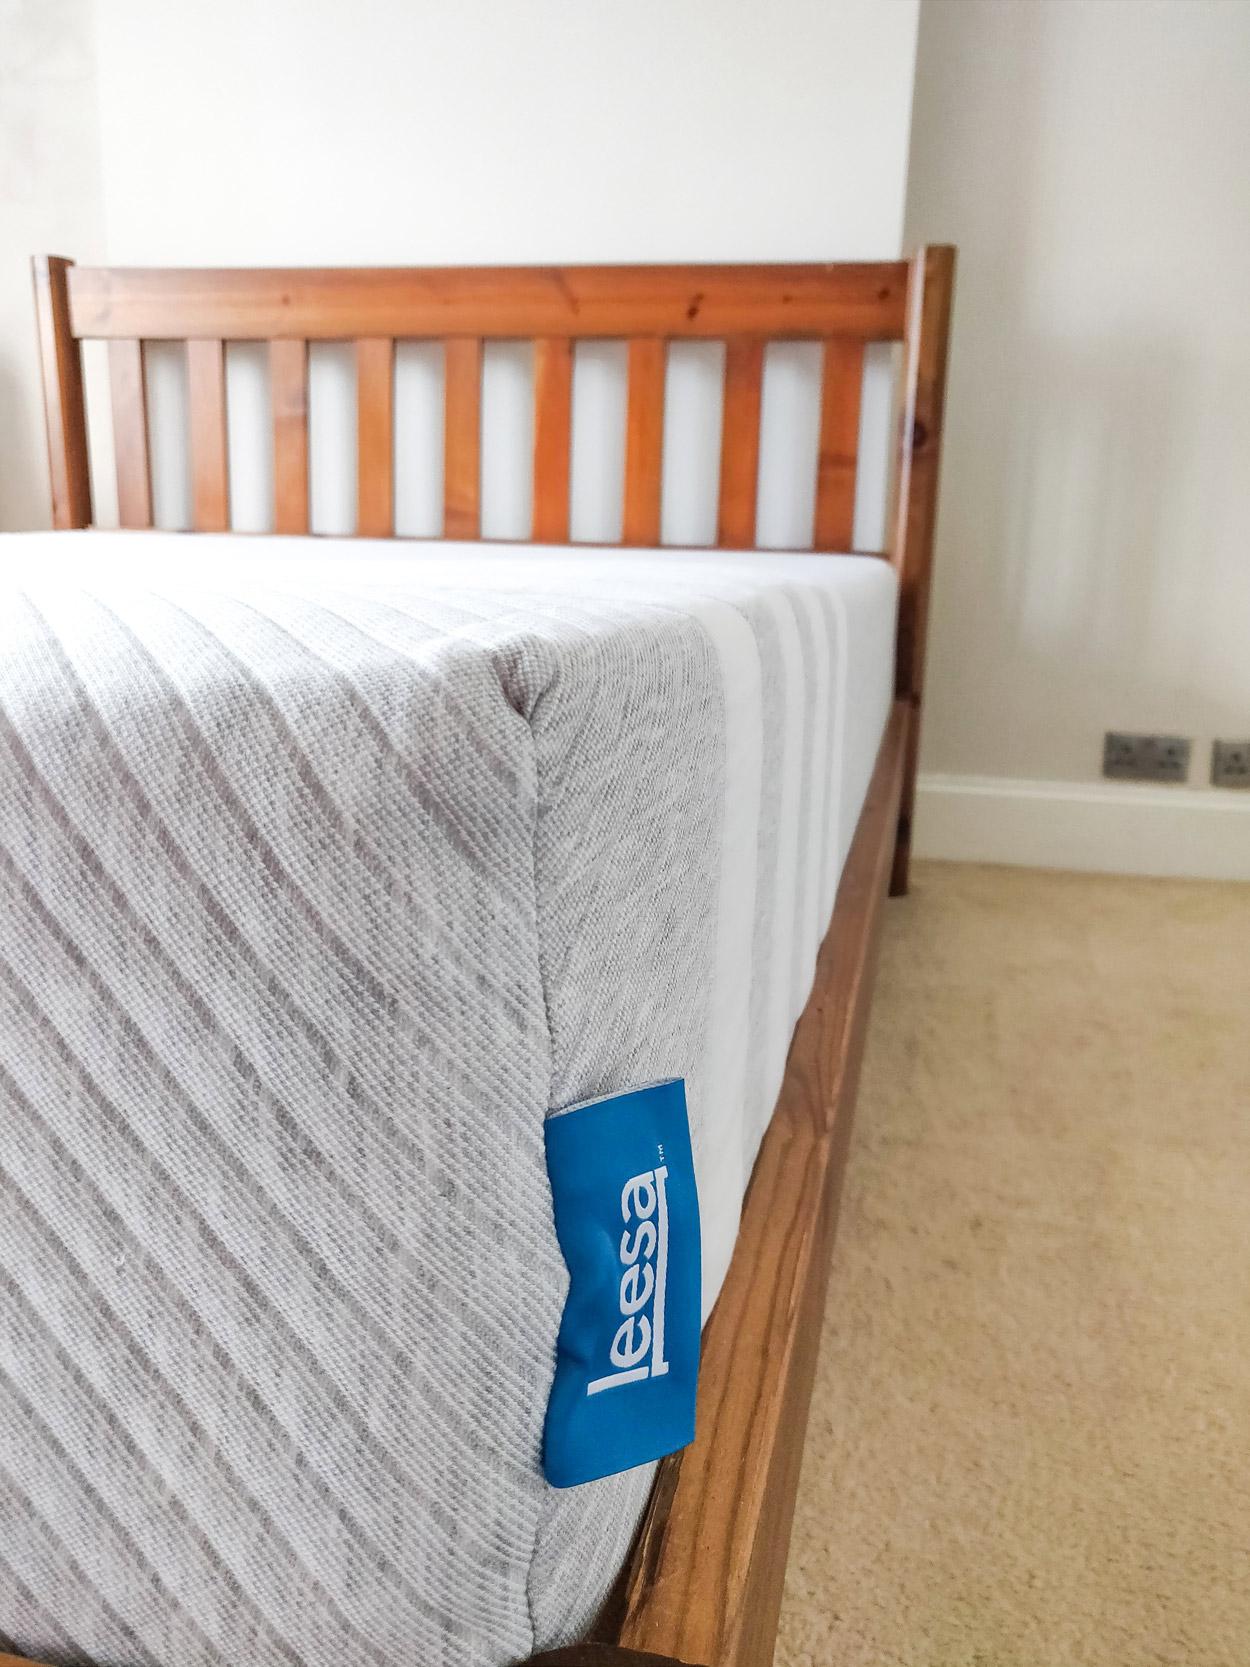 Leesa-Mattress---king-size-review--bedroom---eygptian-cotton-renovation-thebeautytype.com-